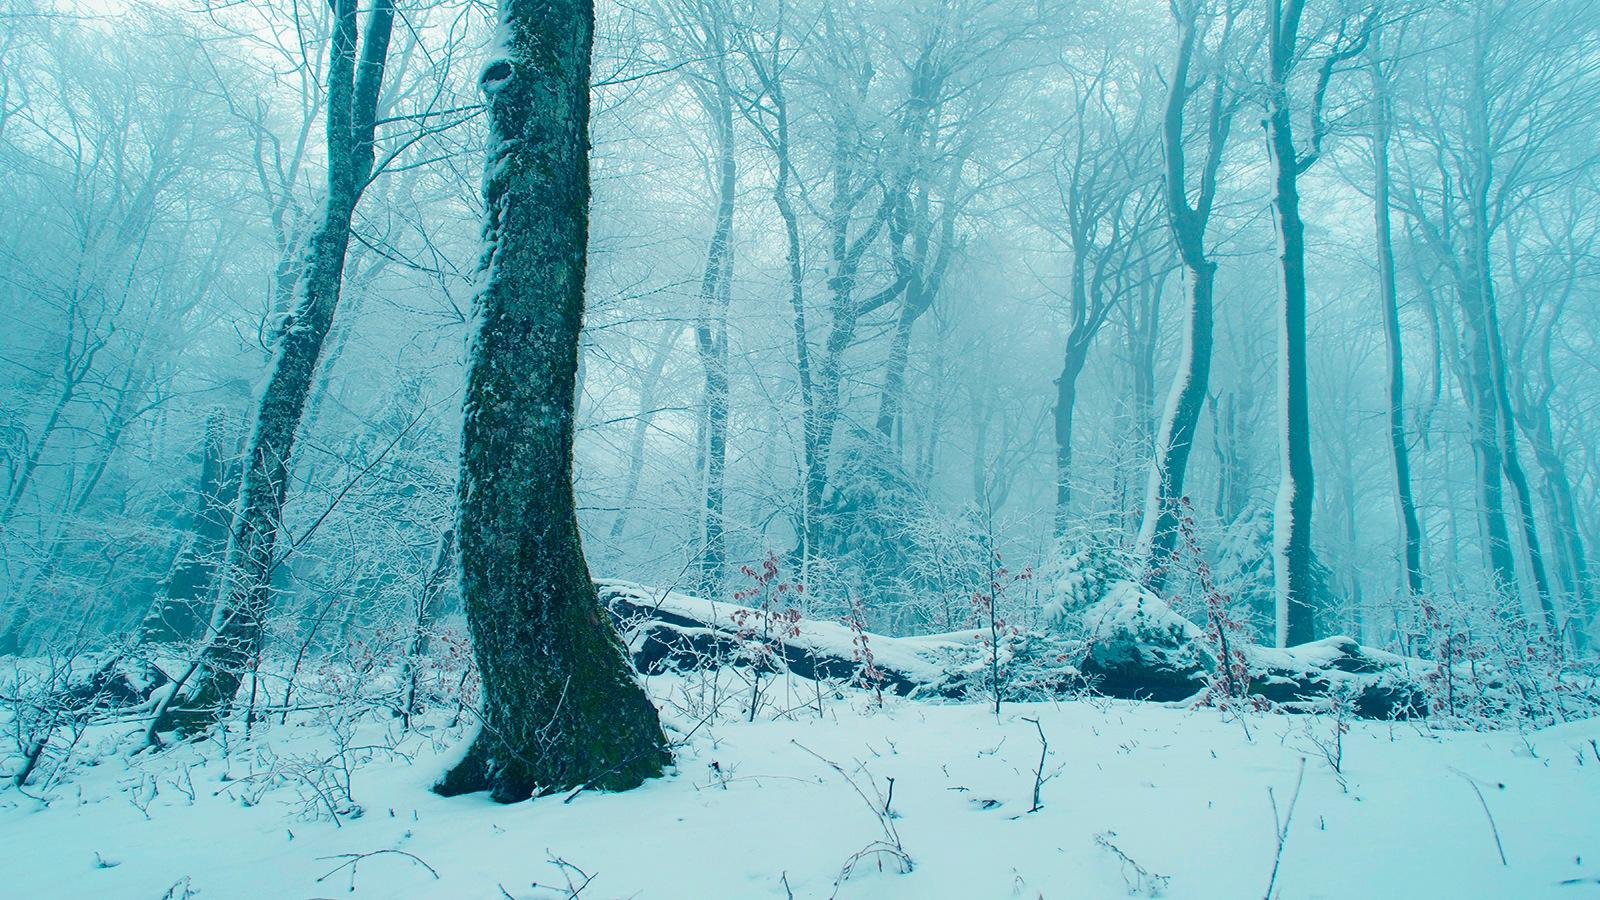 Winter forest by mugurelcm